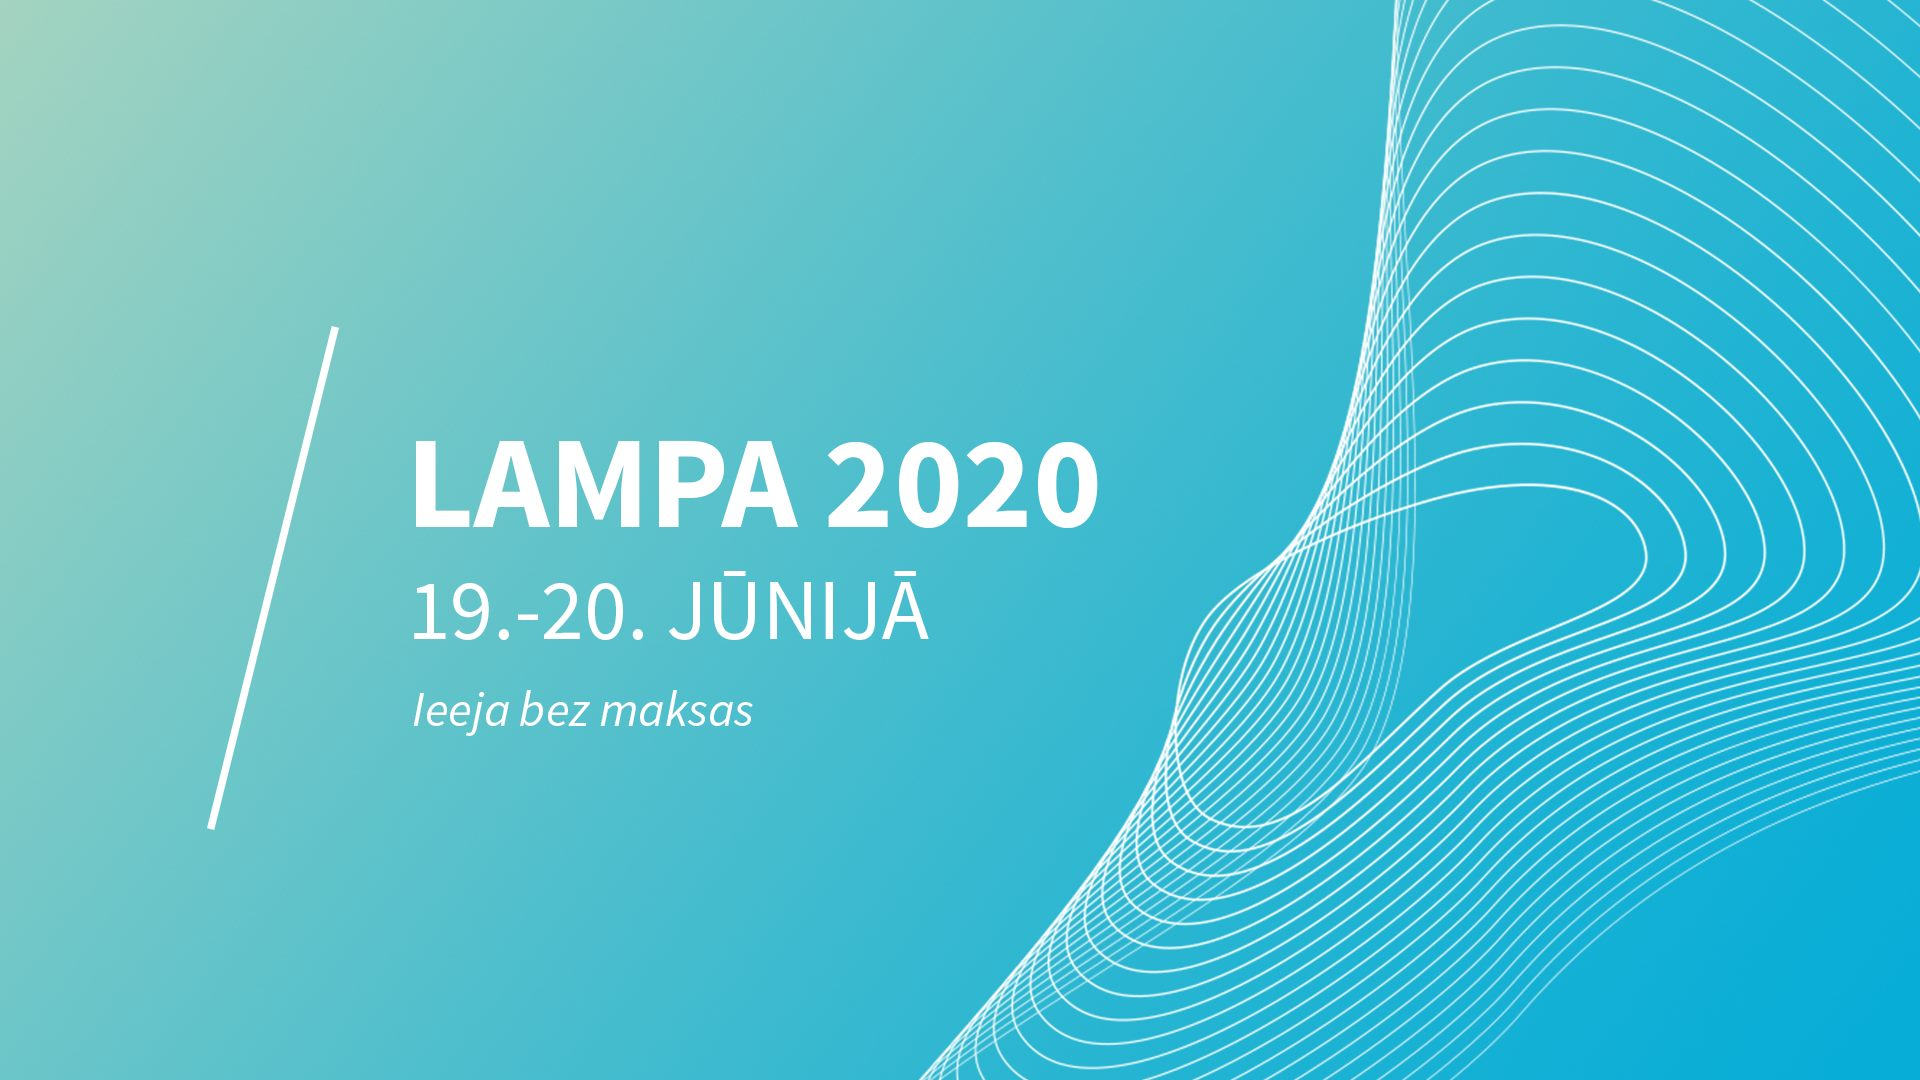 Sarunu festivāls LAMPA 2020